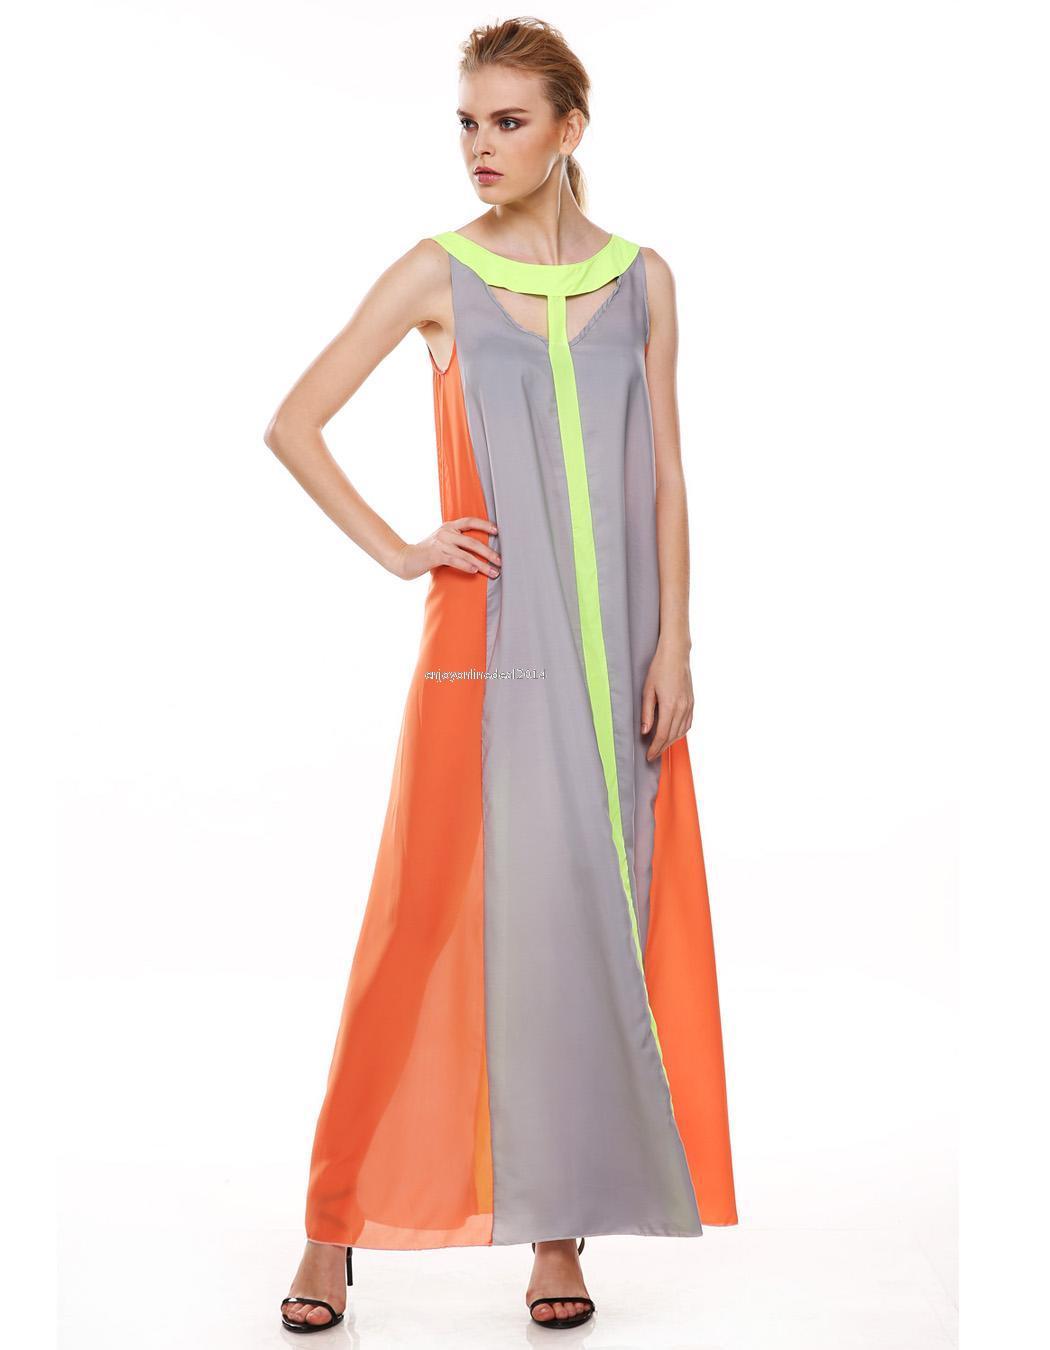 Womens Boho Long Maxi Dress Evening Cocktail Party Beach Chiffon Dress NNE1